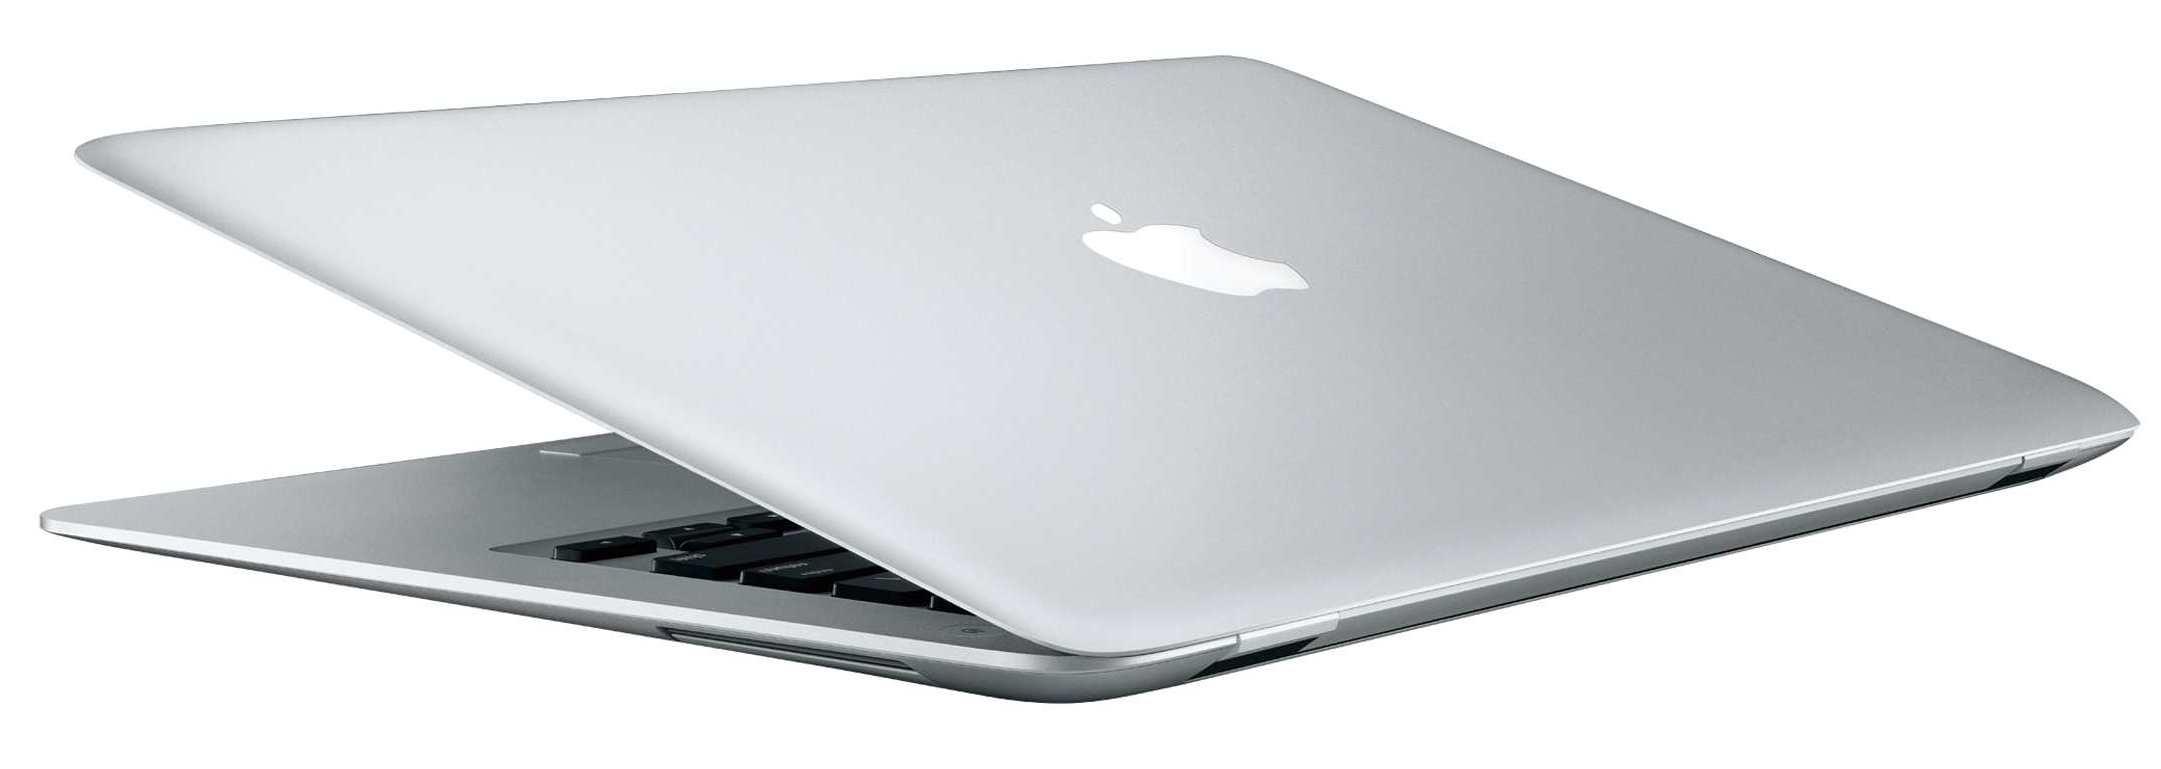 Apple MacBook Air Download HD Wallpapers 2161x769